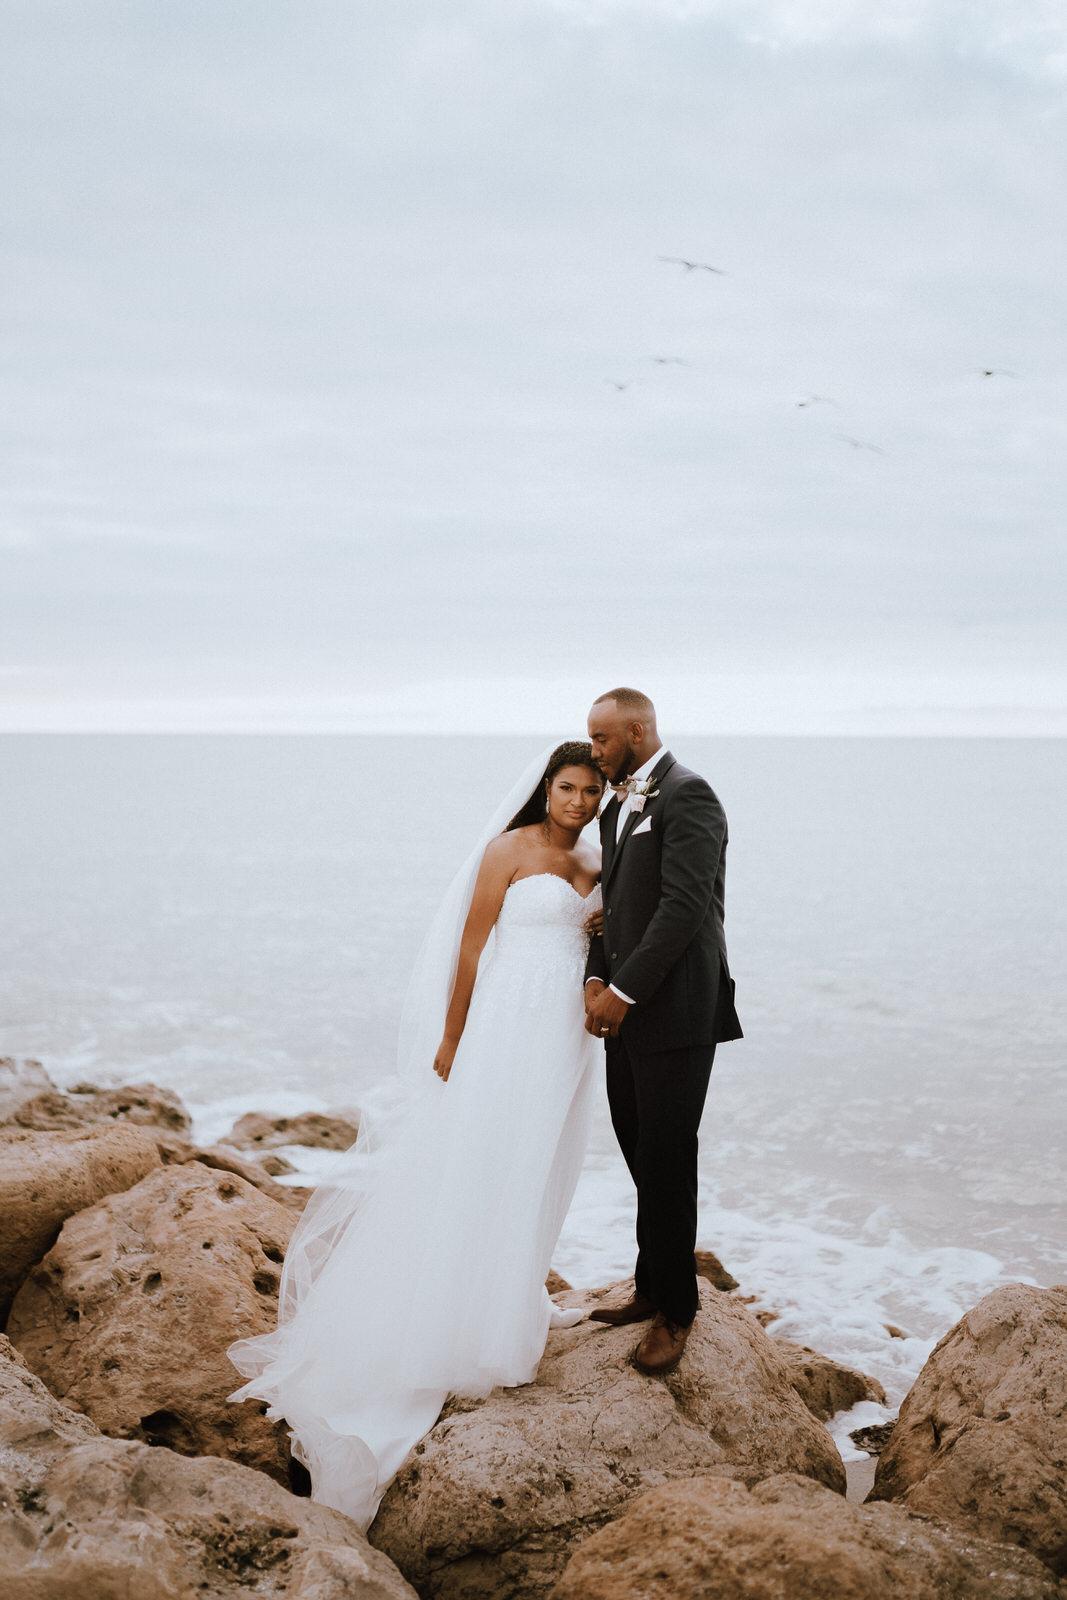 South Seas Island Resort Elopement- Alyana and Shawn- Michelle Gonzalez Photography-559.JPG